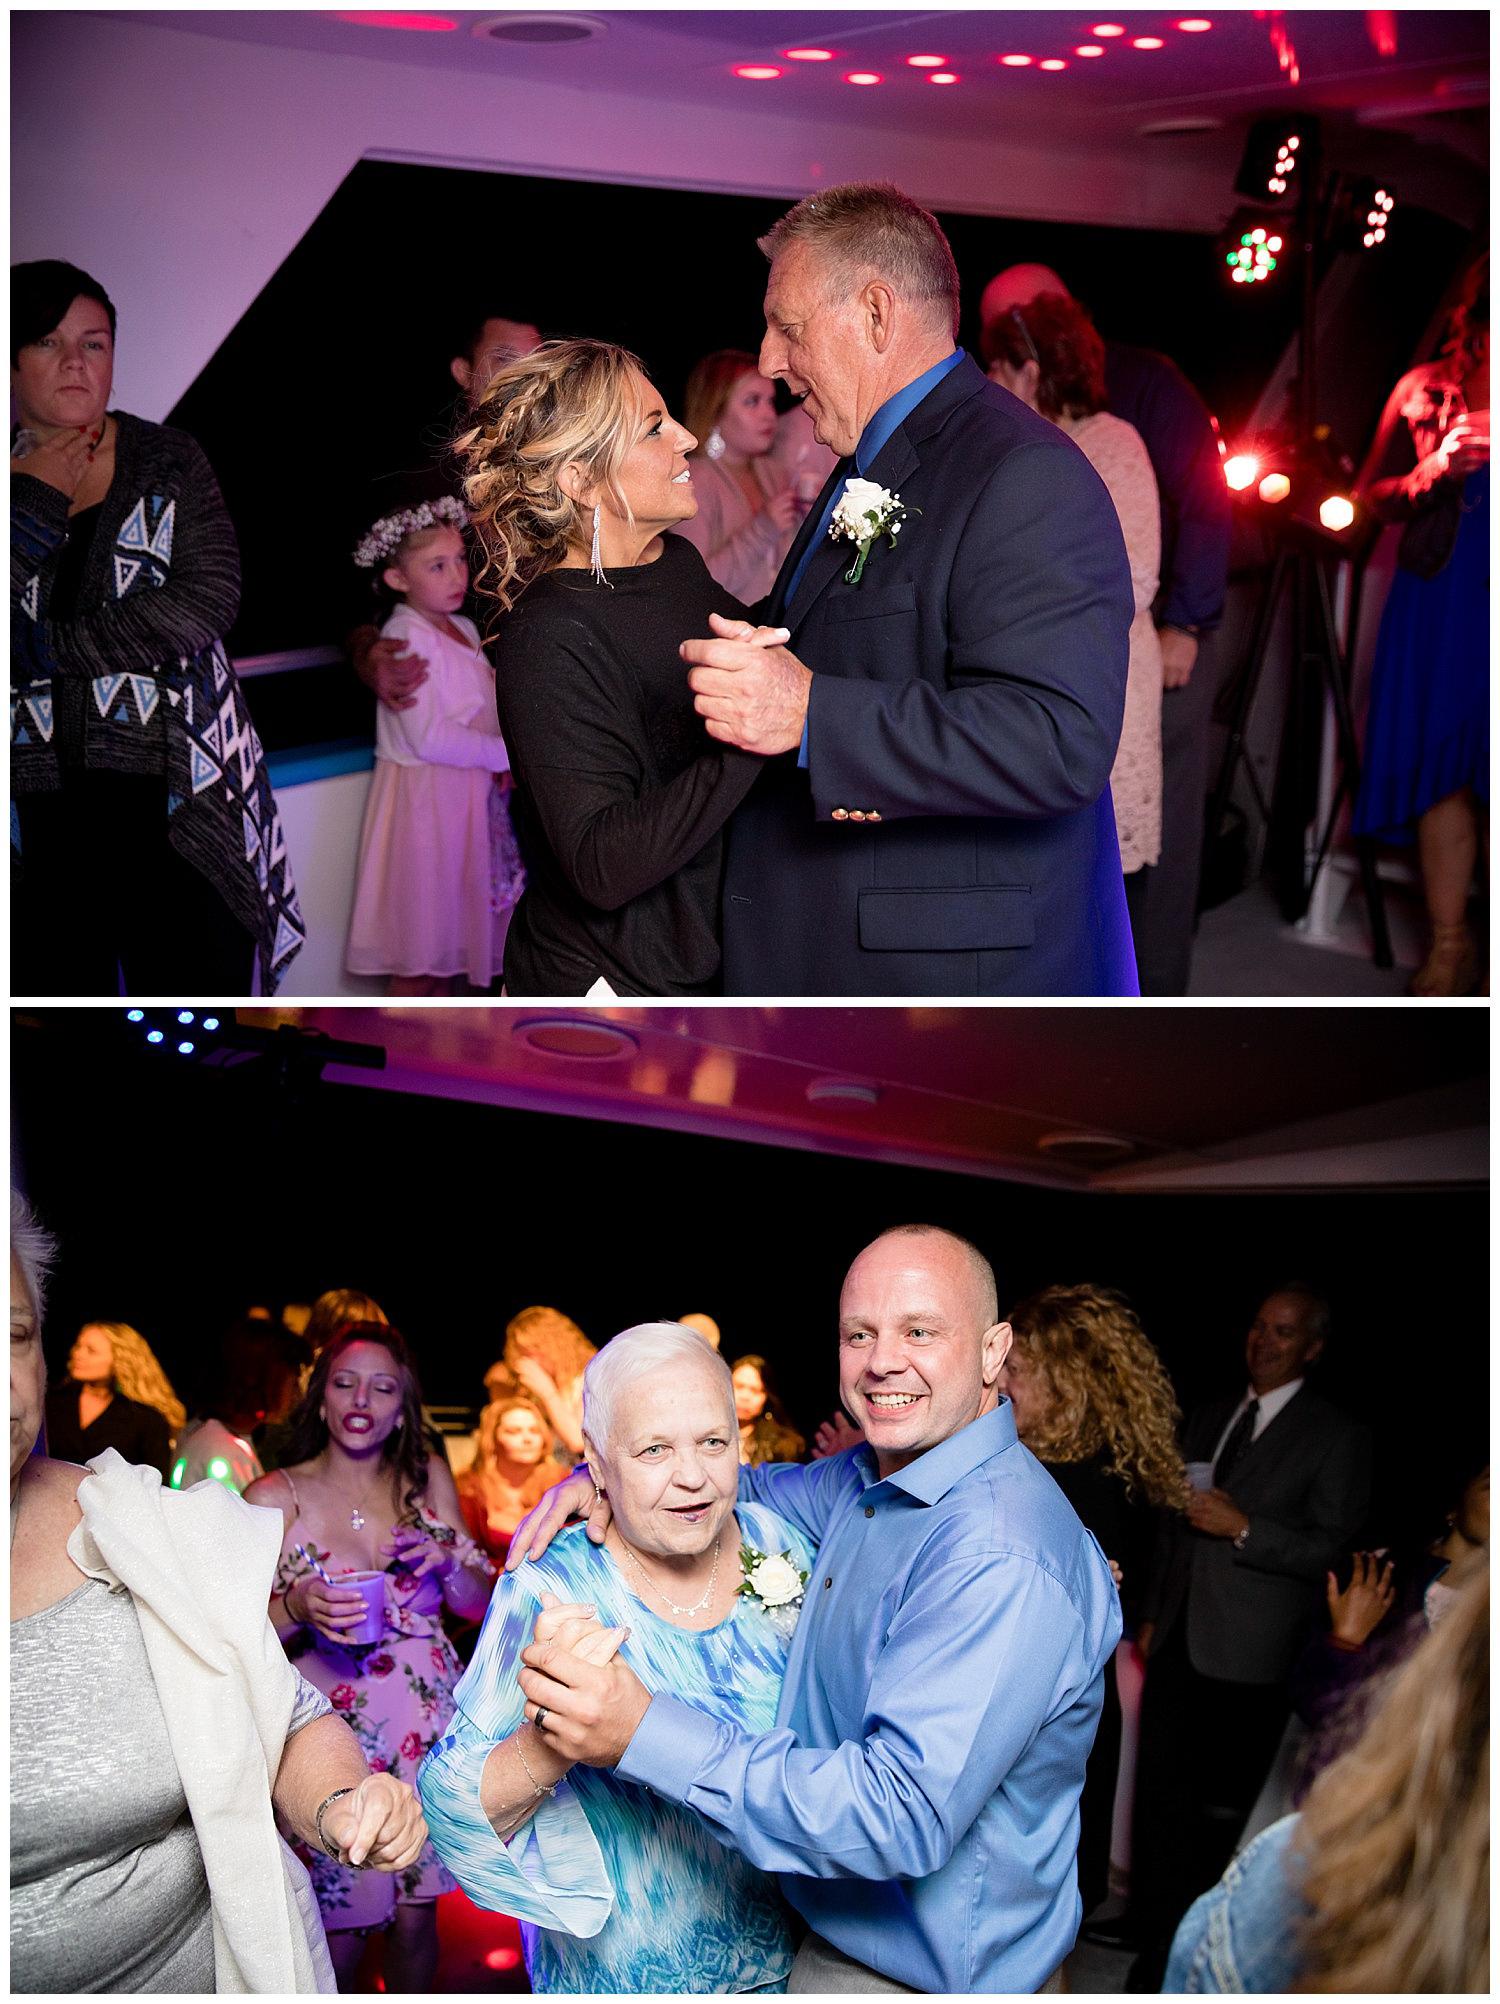 boston-wedding-photographer-26-north-studios-031.jpg